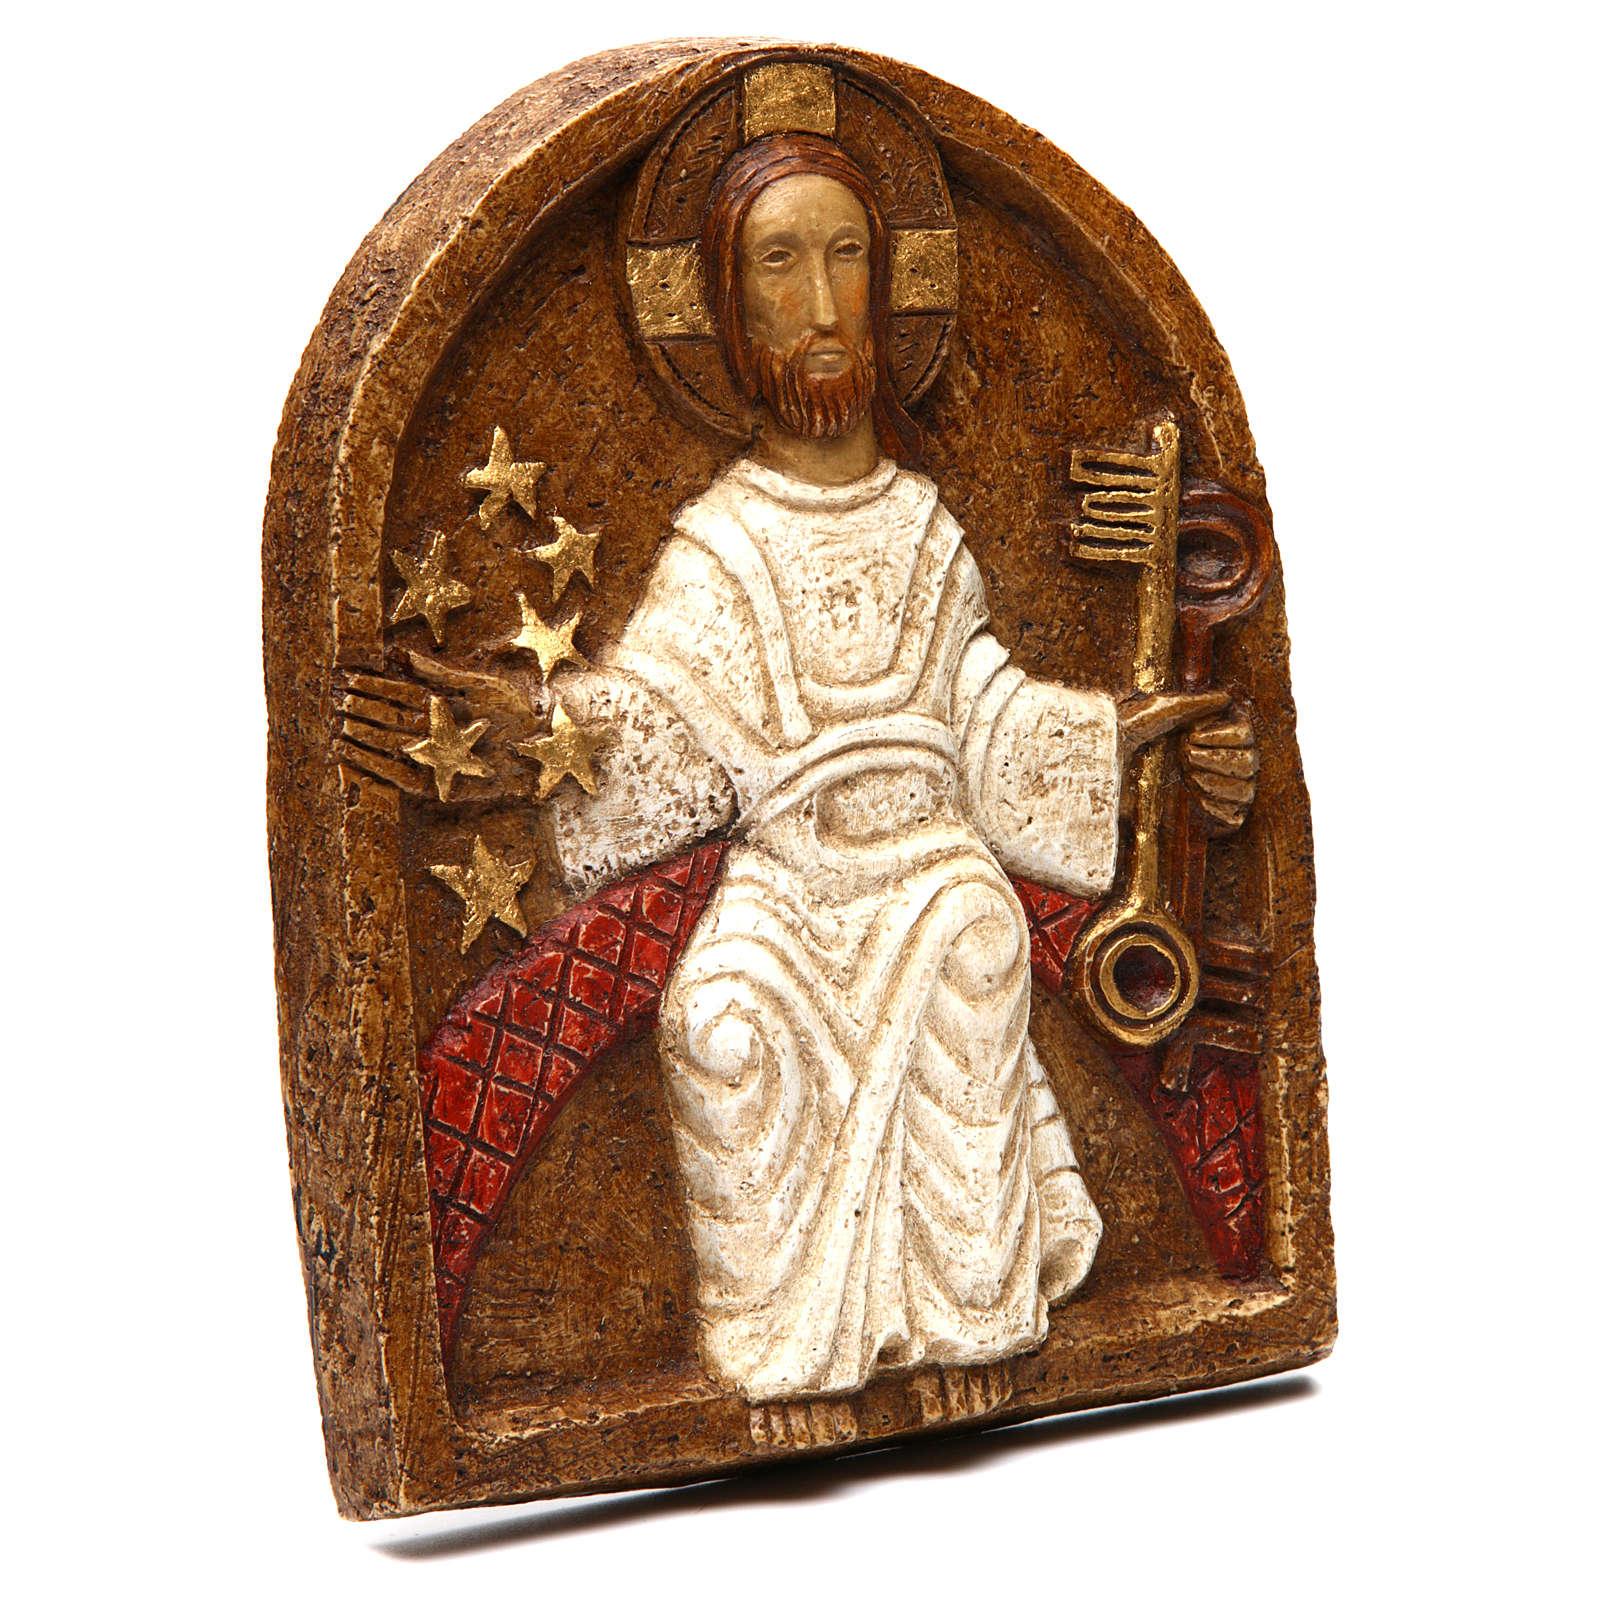 Bas-relief de Jésus dan son splendeur 4